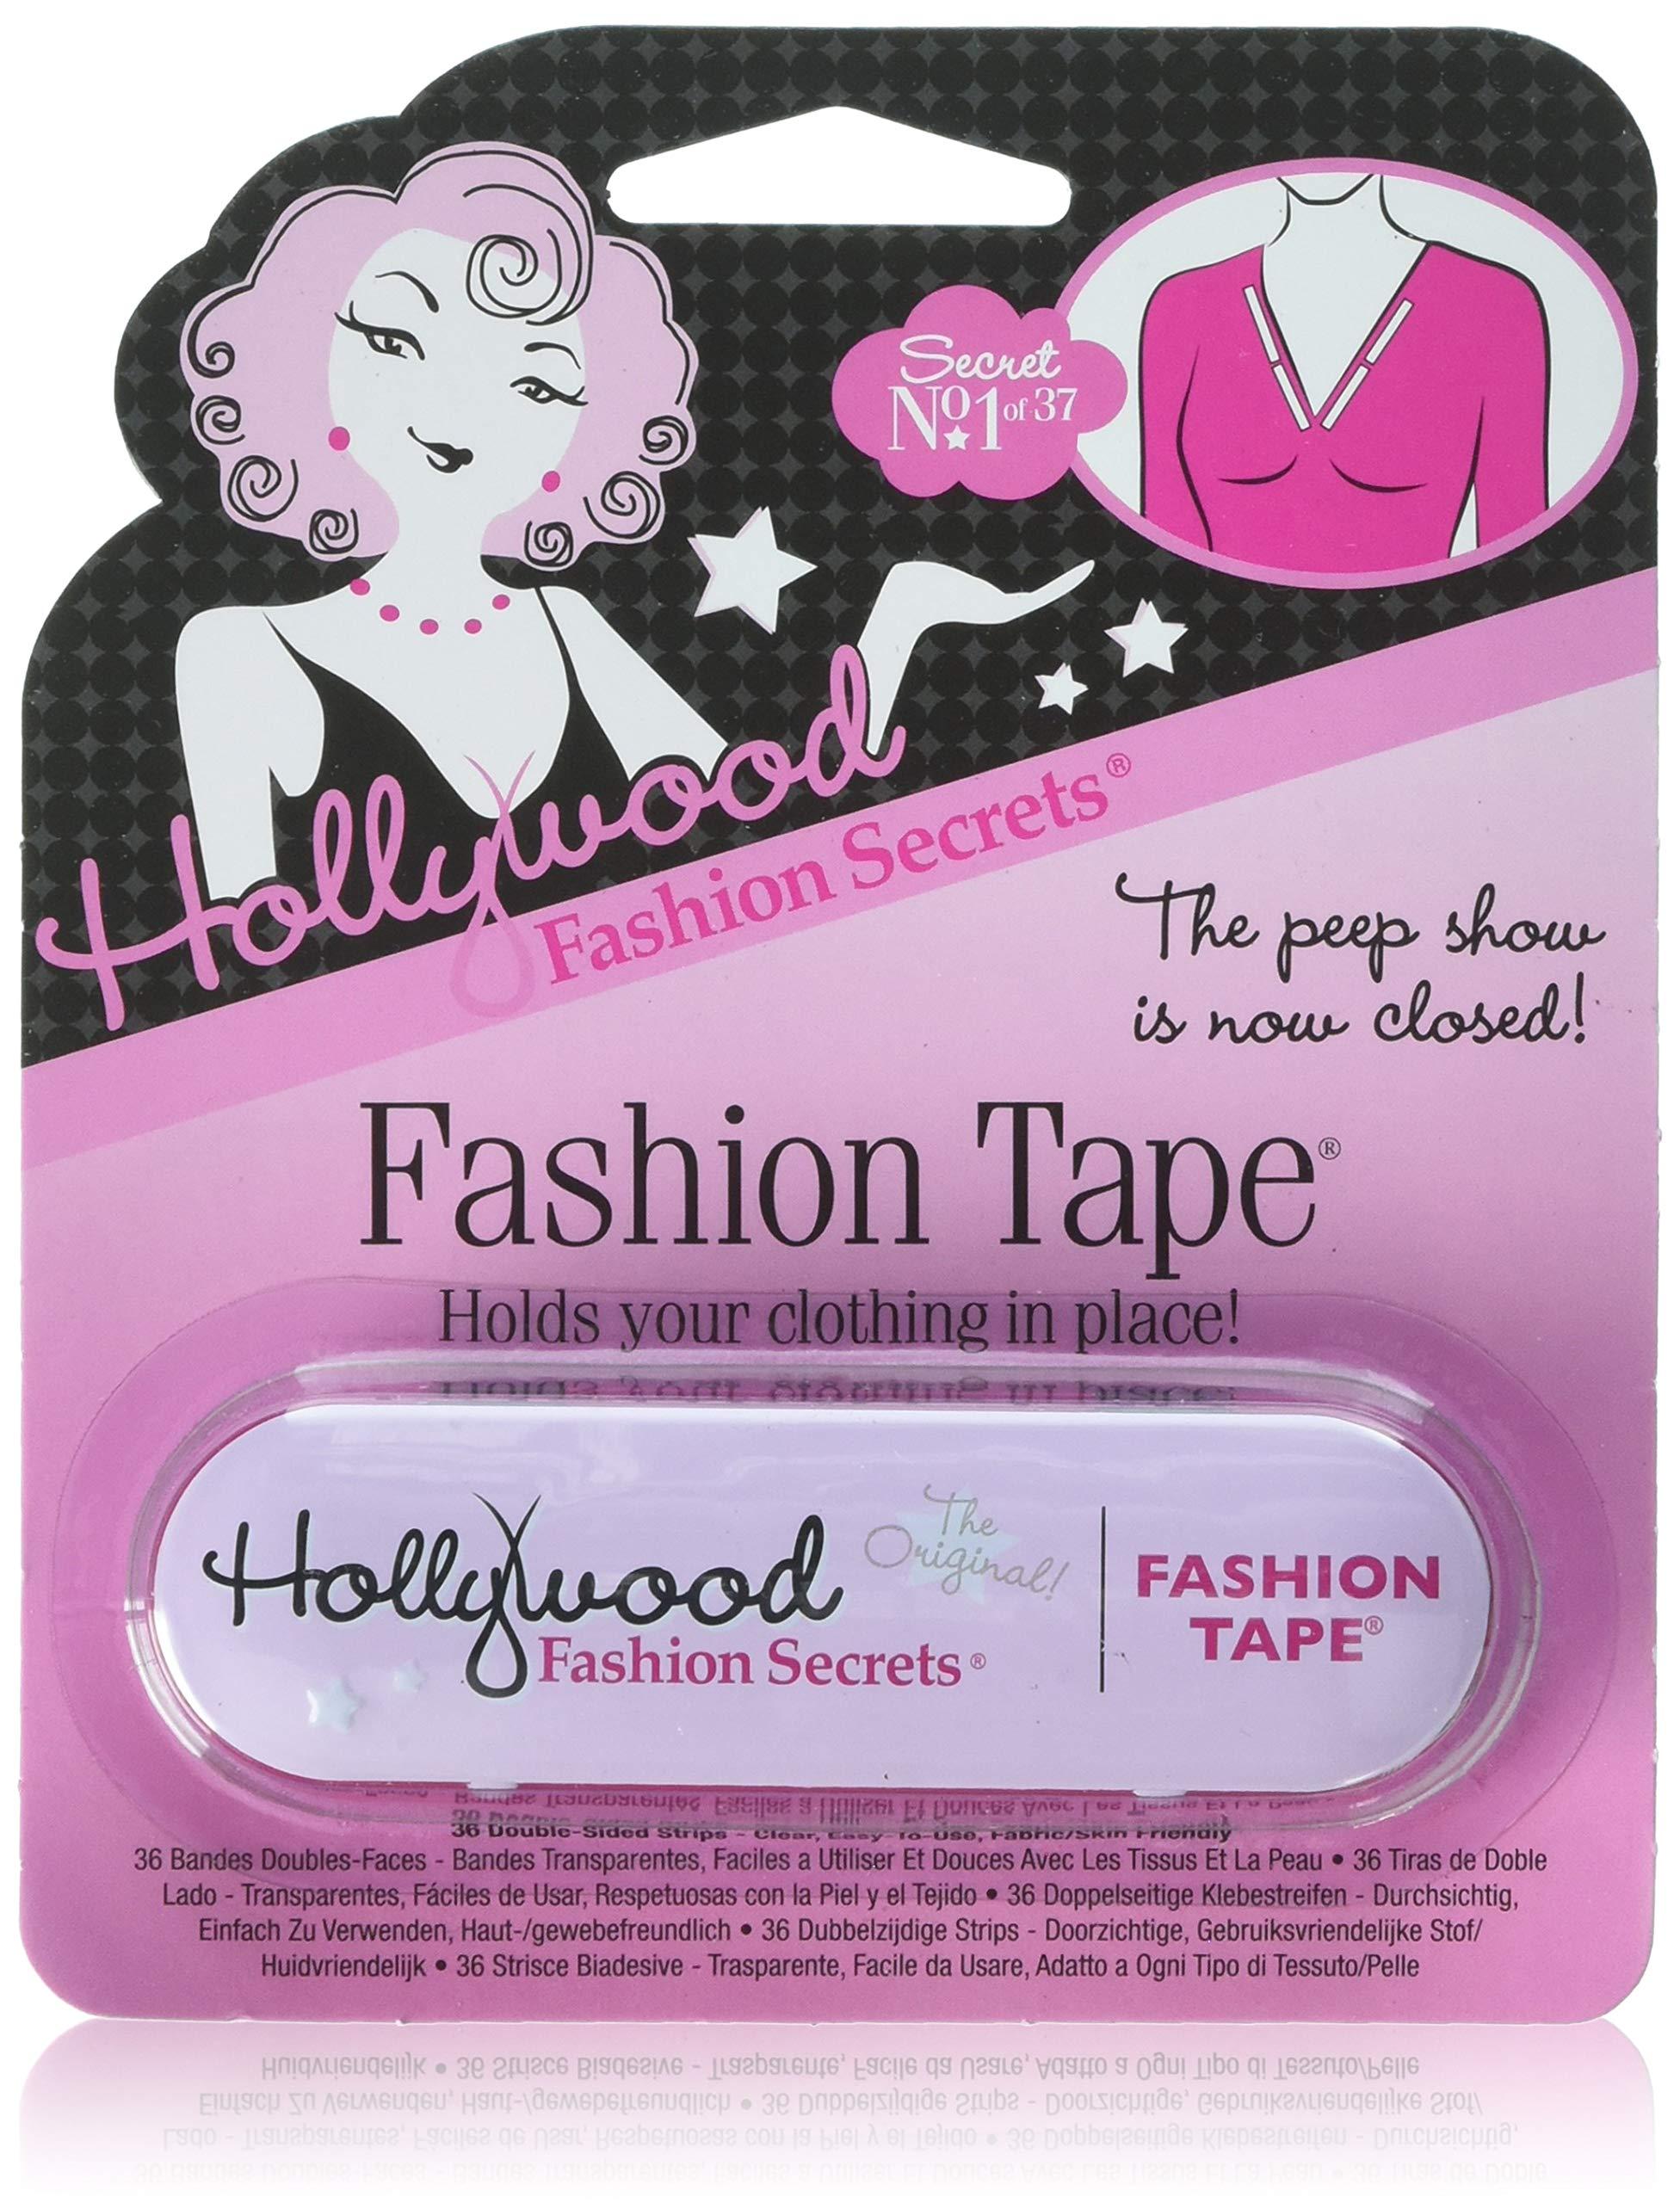 Hollywood Fashion Tape HFT 101